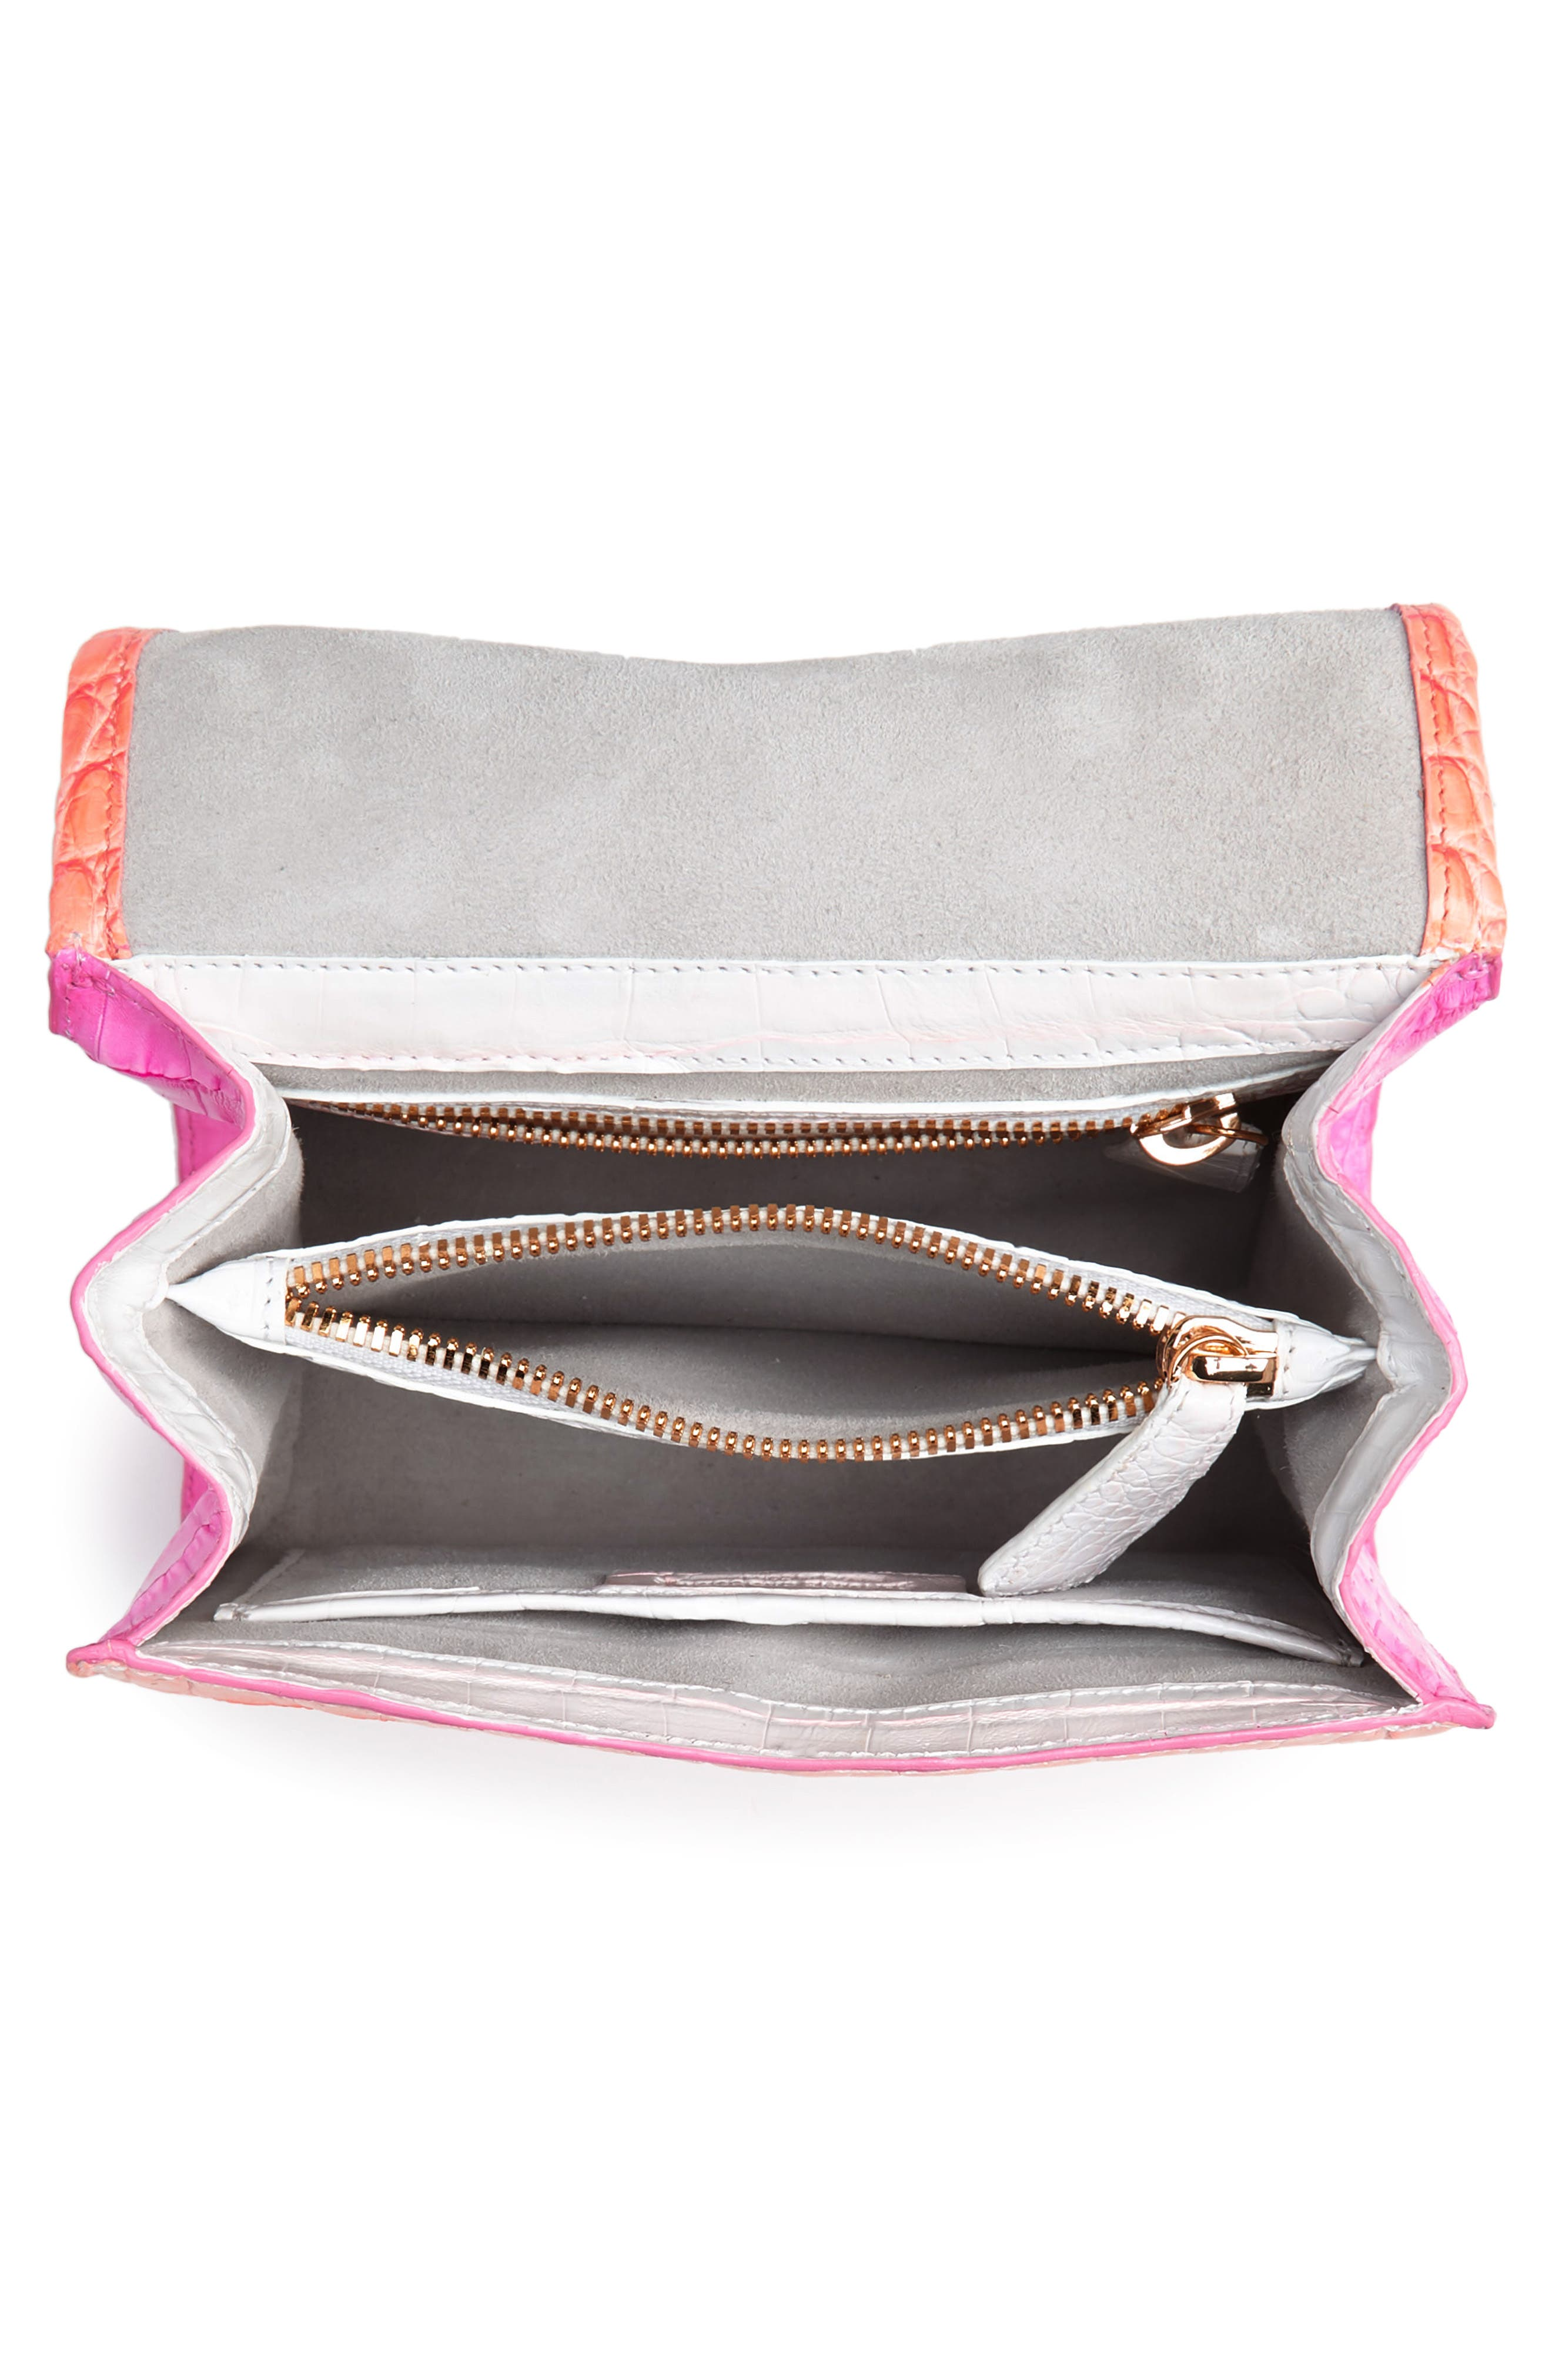 NANCY GONZALEZ, Mini Lily Genuine Crocodile Crossbody Bag, Alternate thumbnail 4, color, PINK DEGRADE